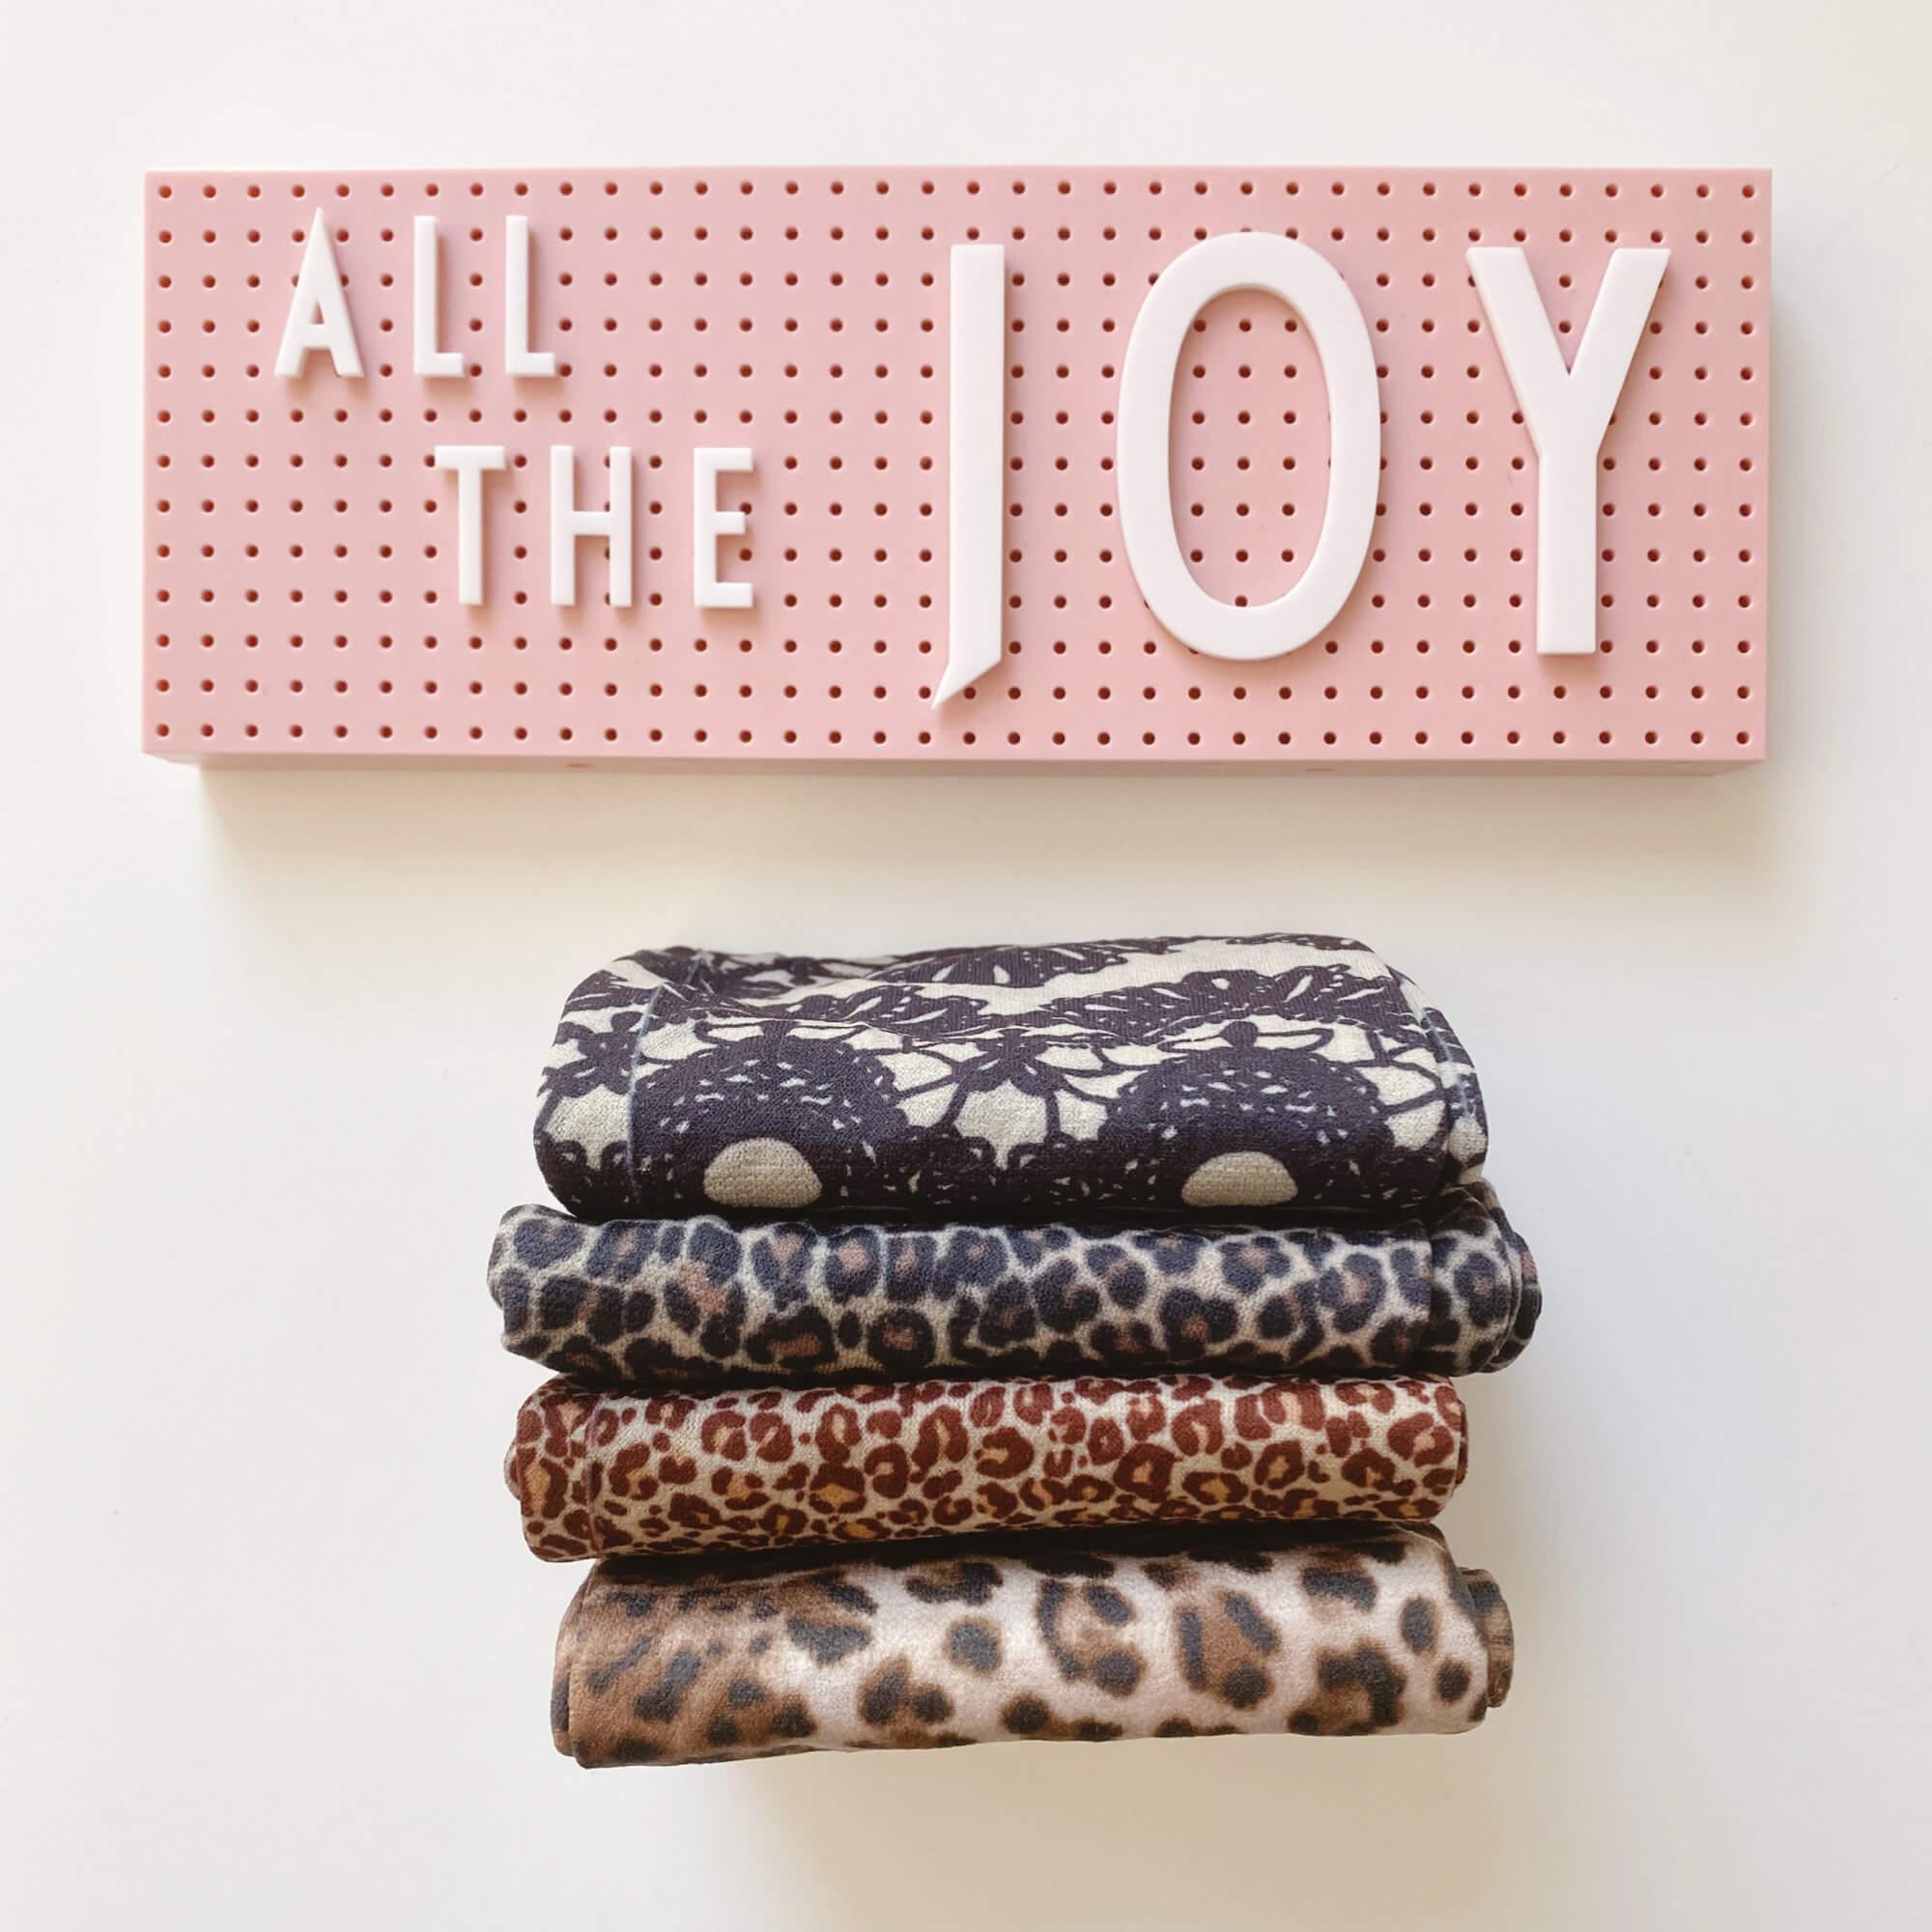 KonMari Folding. Neatly Folded Stockings That Spark Joy Using The KonMari Method Of Tidying